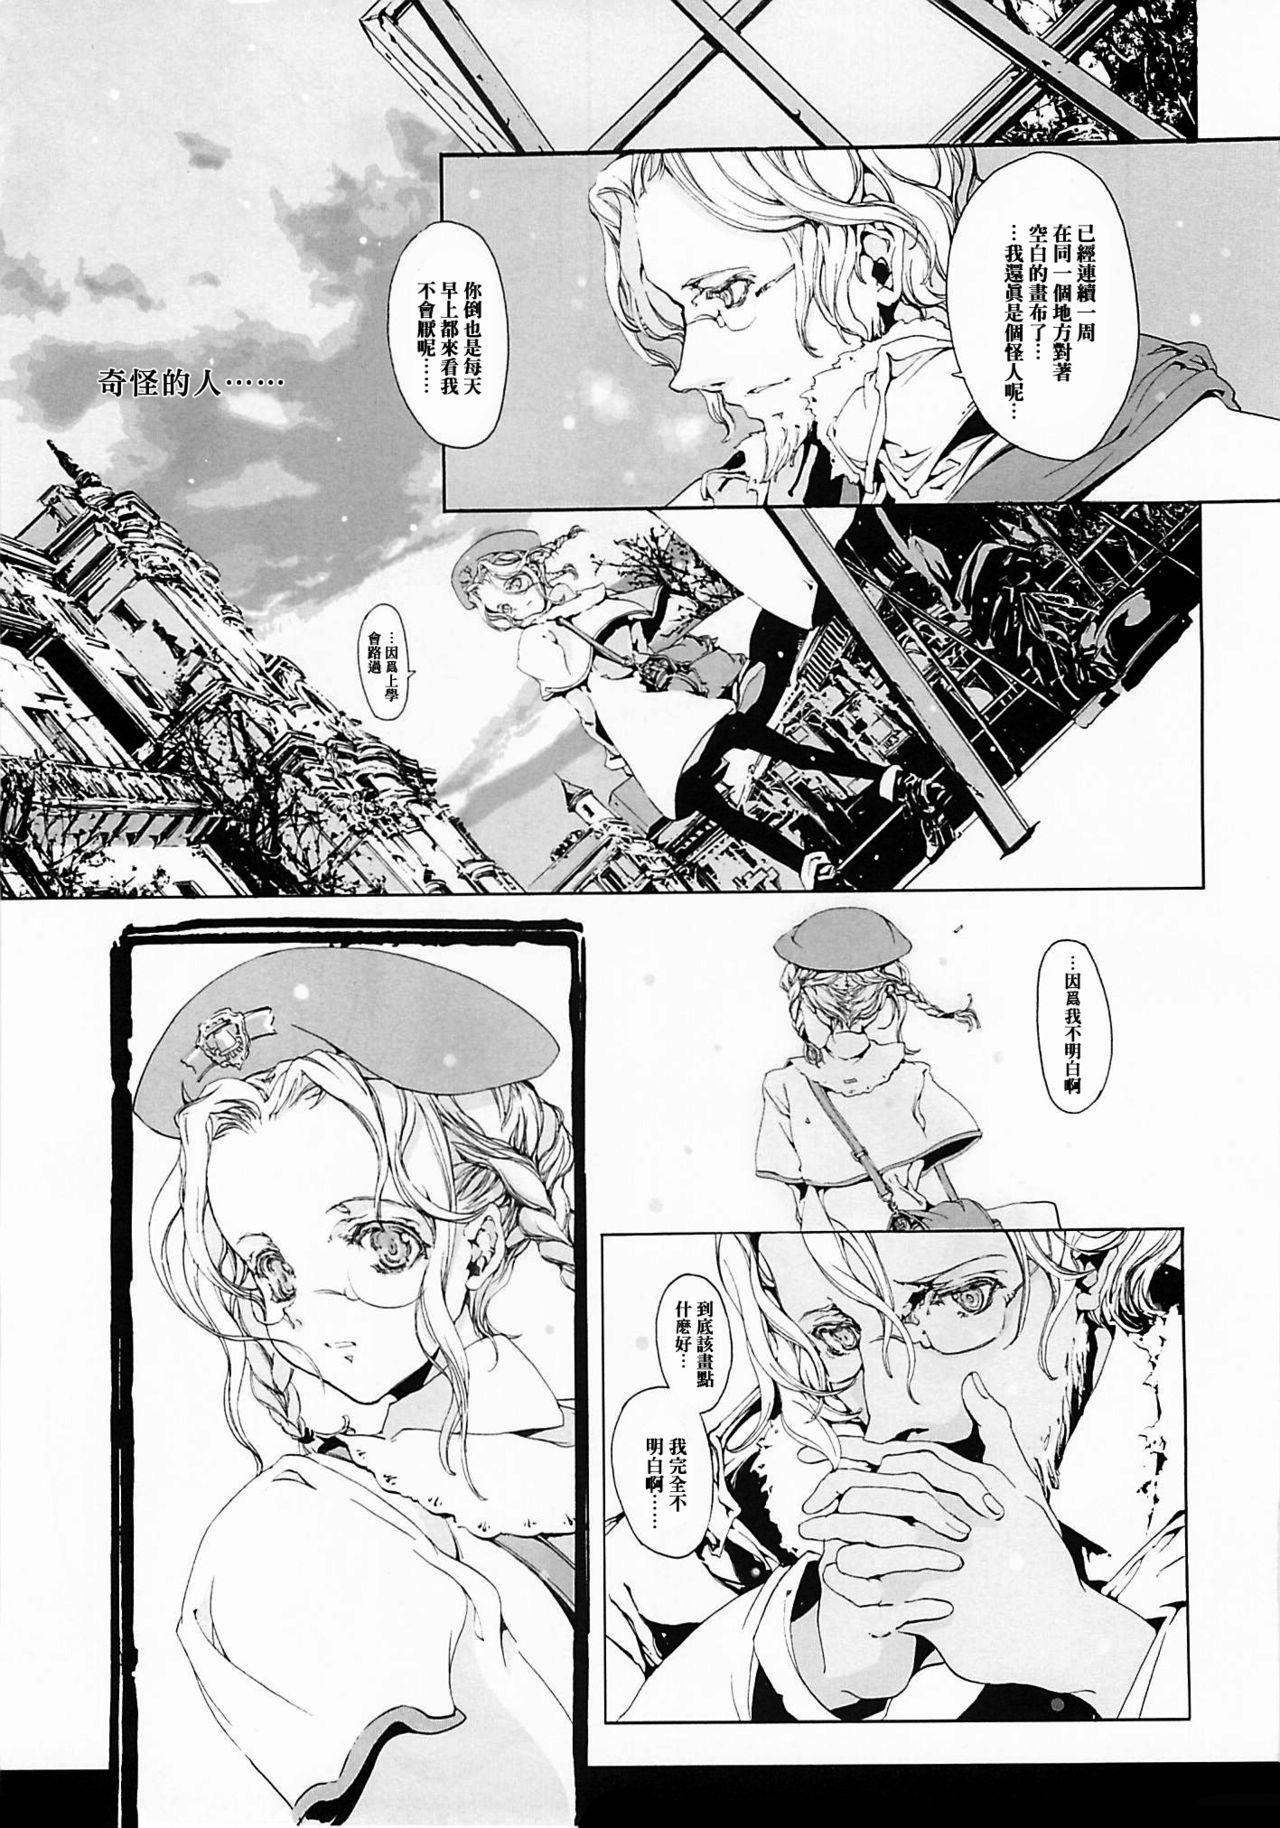 (CR37) [70 Nenshiki Yuukyuu Kikan (Endou Okito)] ORGAN-Tino  01-02[Chinese] [拾荒者汉化组] [Incomplete] 31